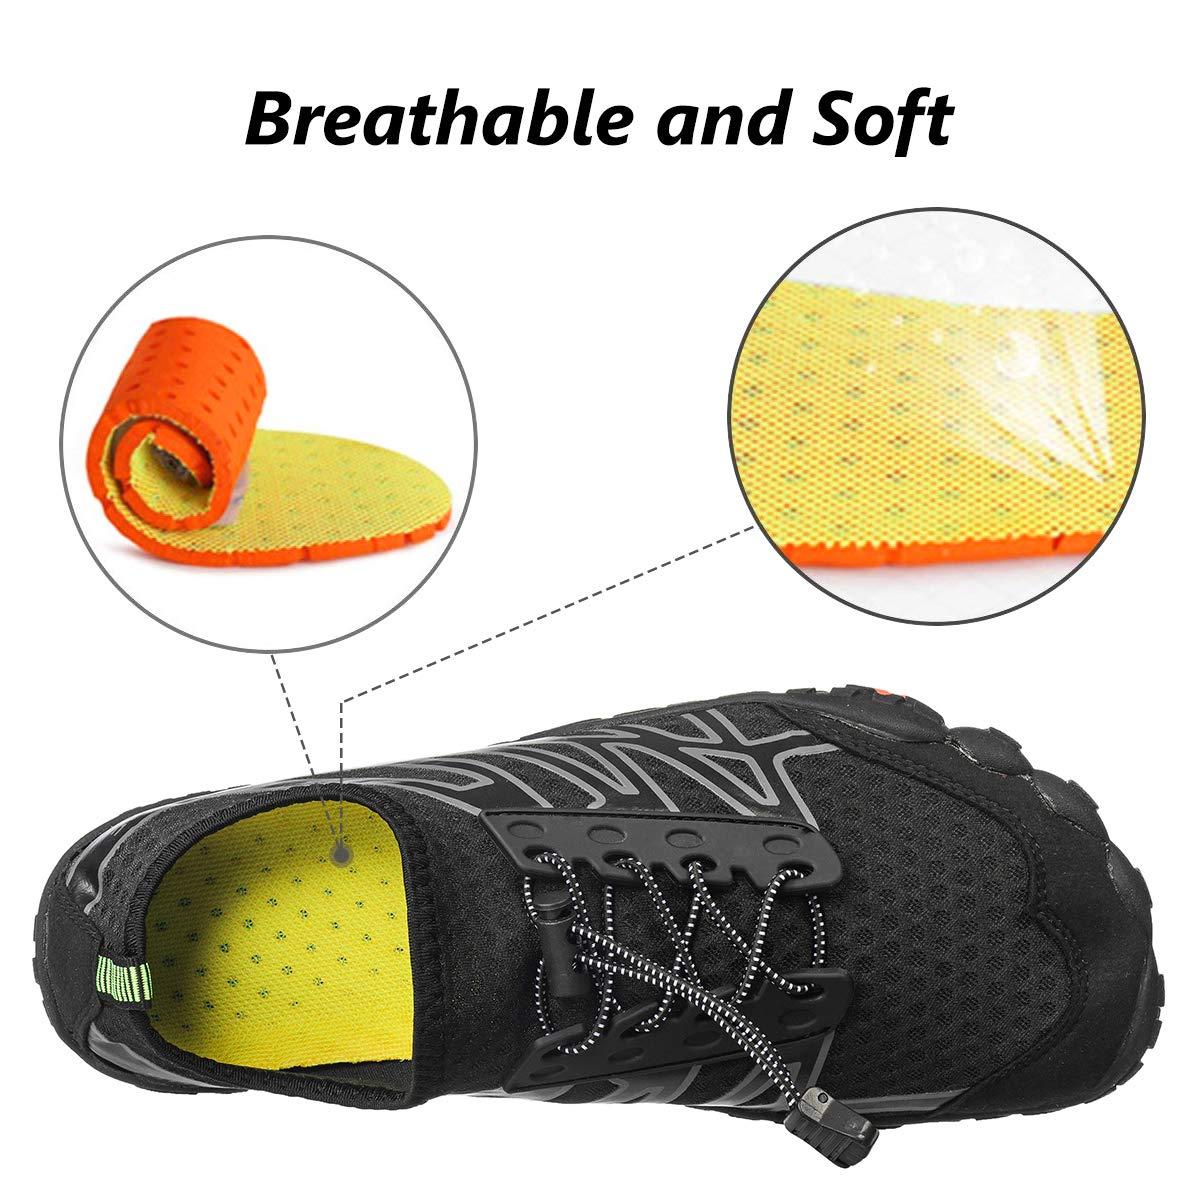 Camfosy Men Women Water Shoes Slip On Quick Dry Barefoot Aqua Socks Swim Shoes Pool Beach Yoga Walking Running Shoes